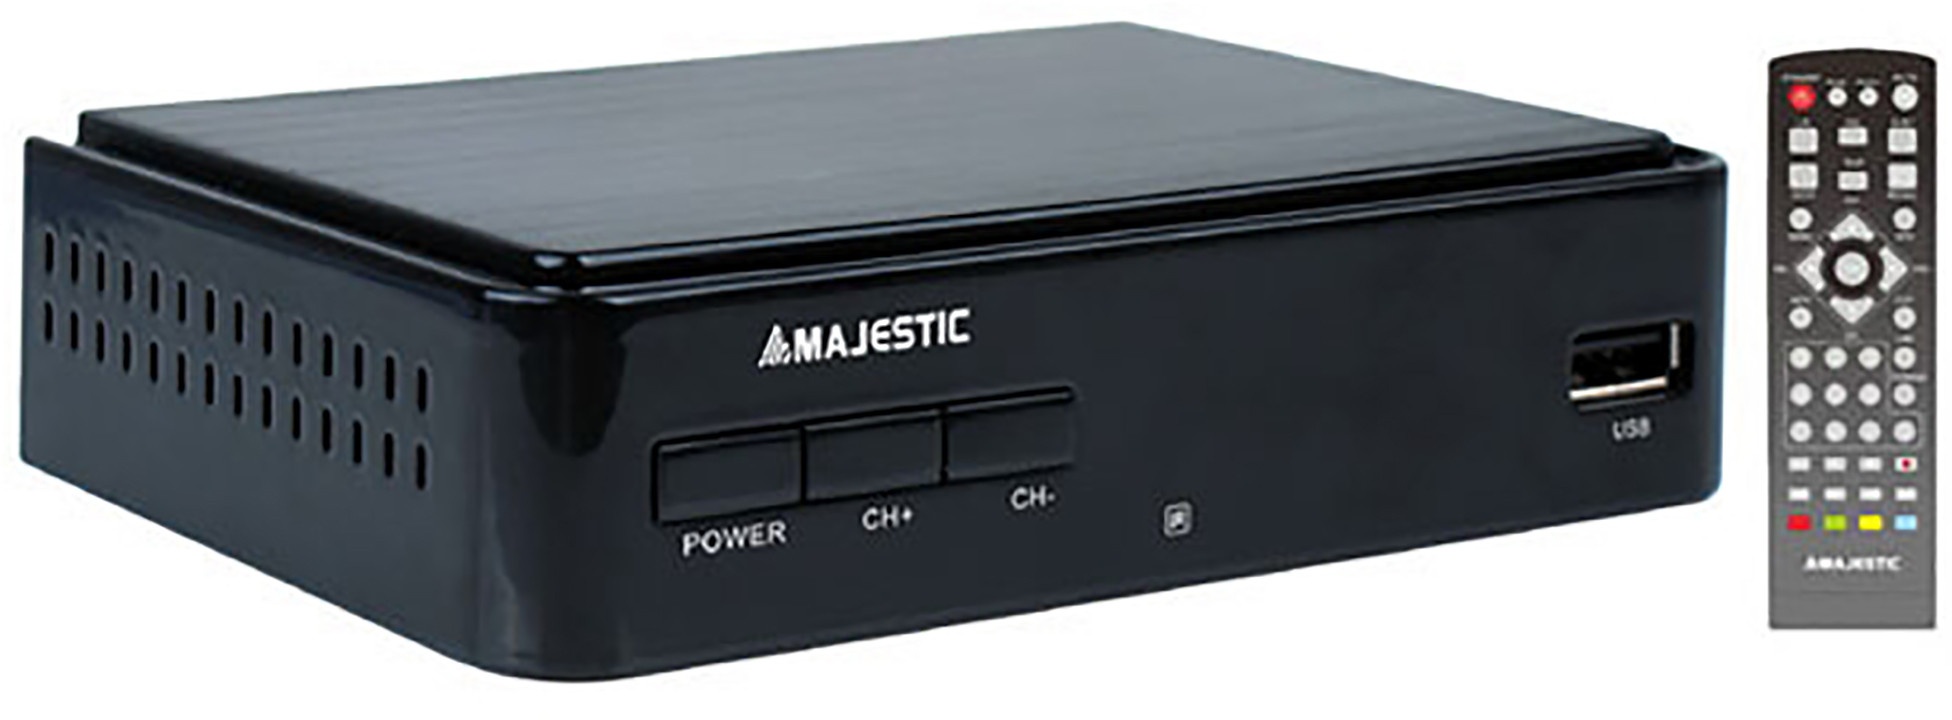 Majestic Majestic Decoder DEC-664 DVB-T/T2 HD/USB/REC Black